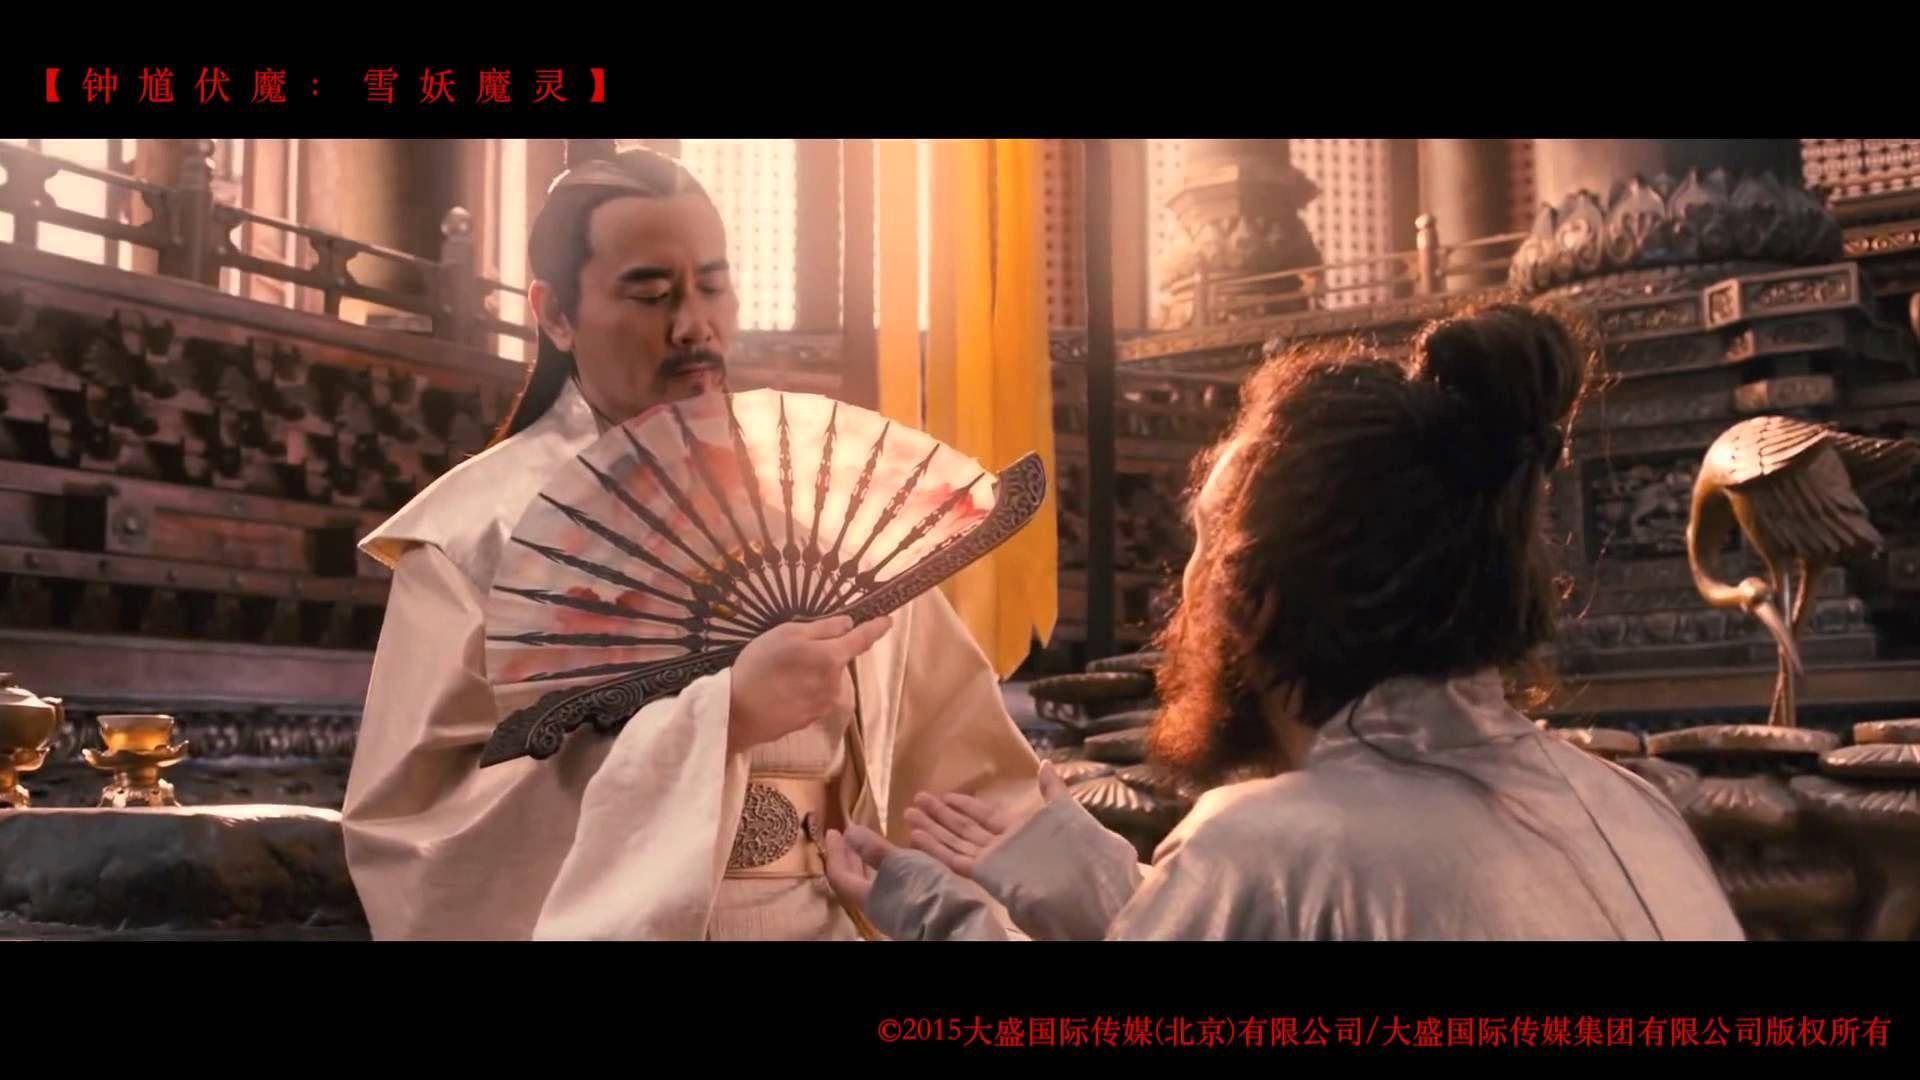 【鍾馗伏魔:雪妖魔靈】ZhongKui Snow Girl and the Dark Crystal 2015 HD高畫質中文電影預告 | Home appliances, Movie trailers, Youtube